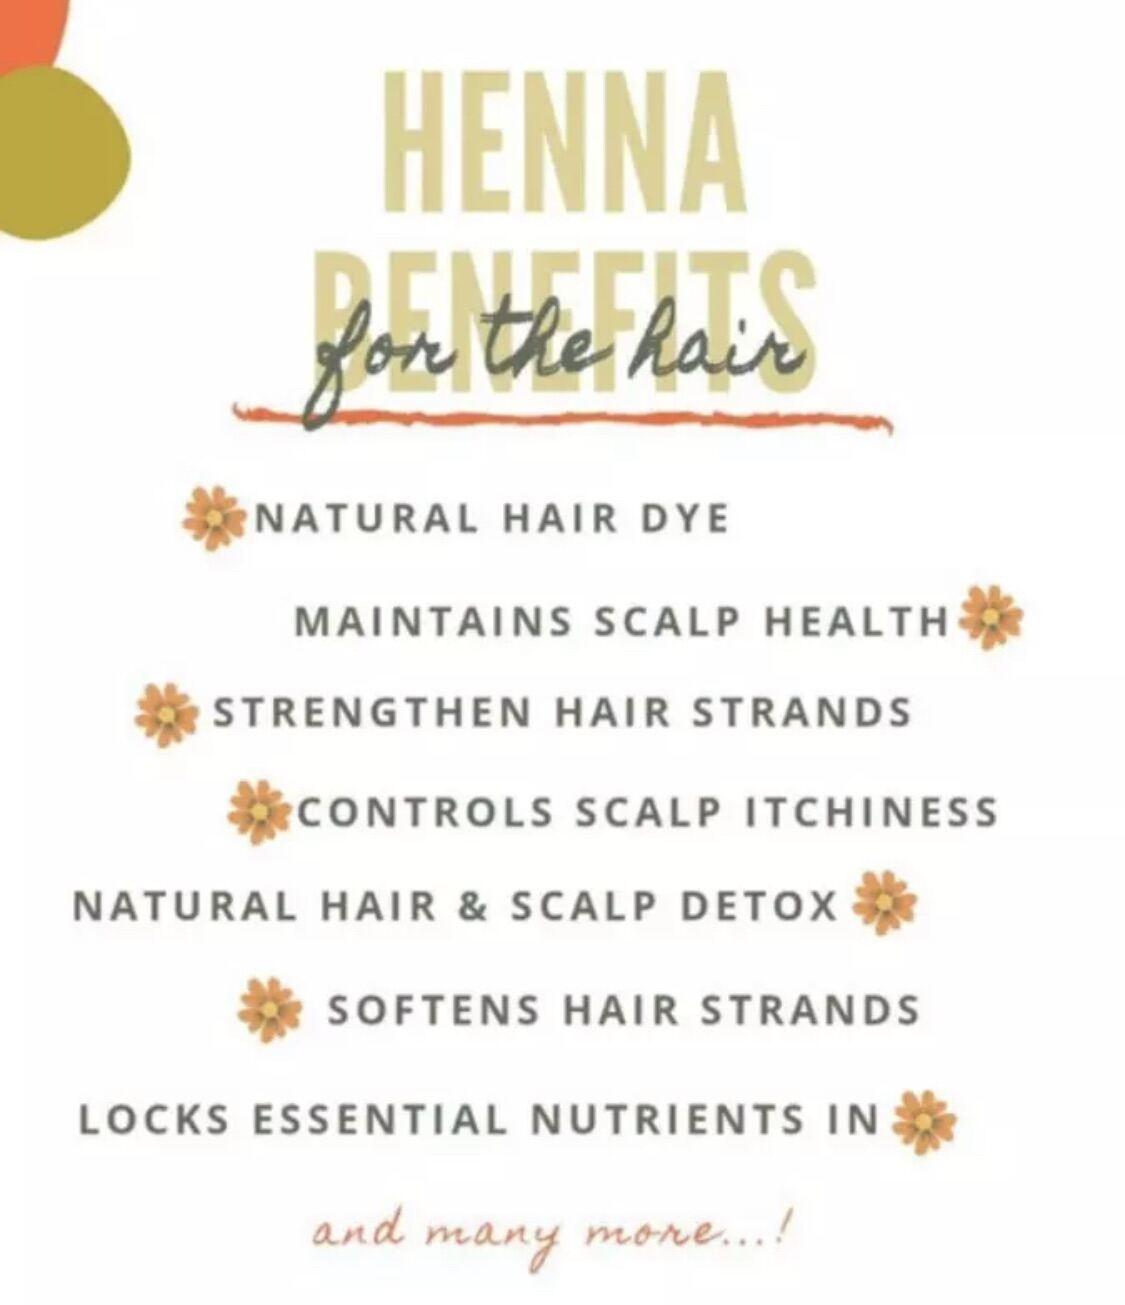 COMBO SET 1 - 2 sets of Ayurvedic Hair Henna Powder (100gm) and 1 bottle of Ayurvedic Hair Care Oil